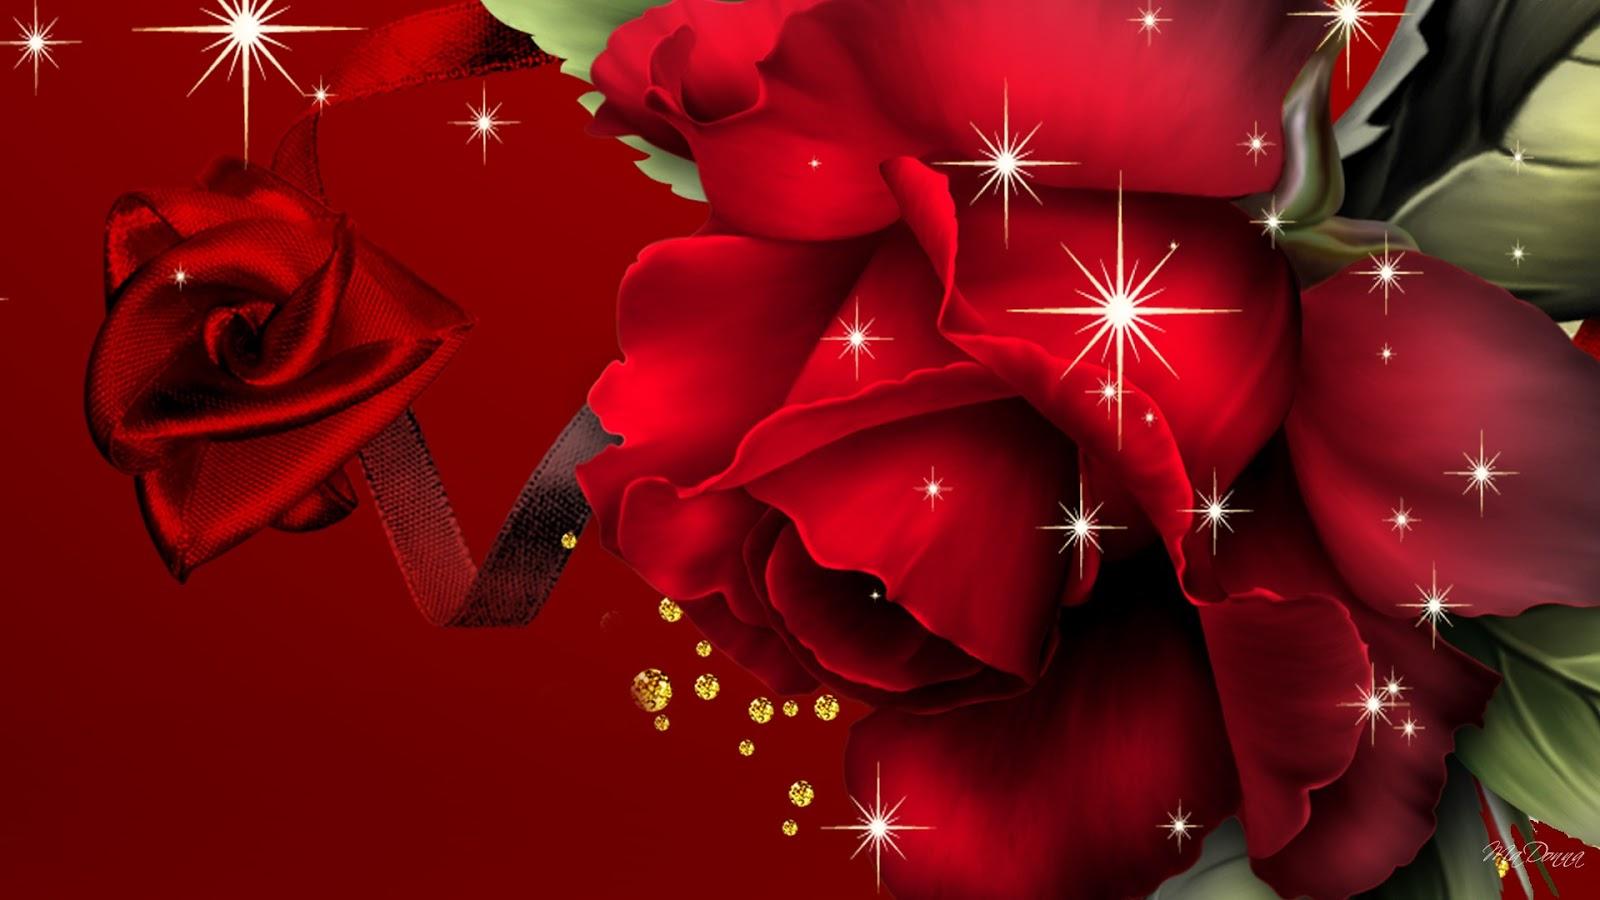 Red Rose 3D Wallpaper HD